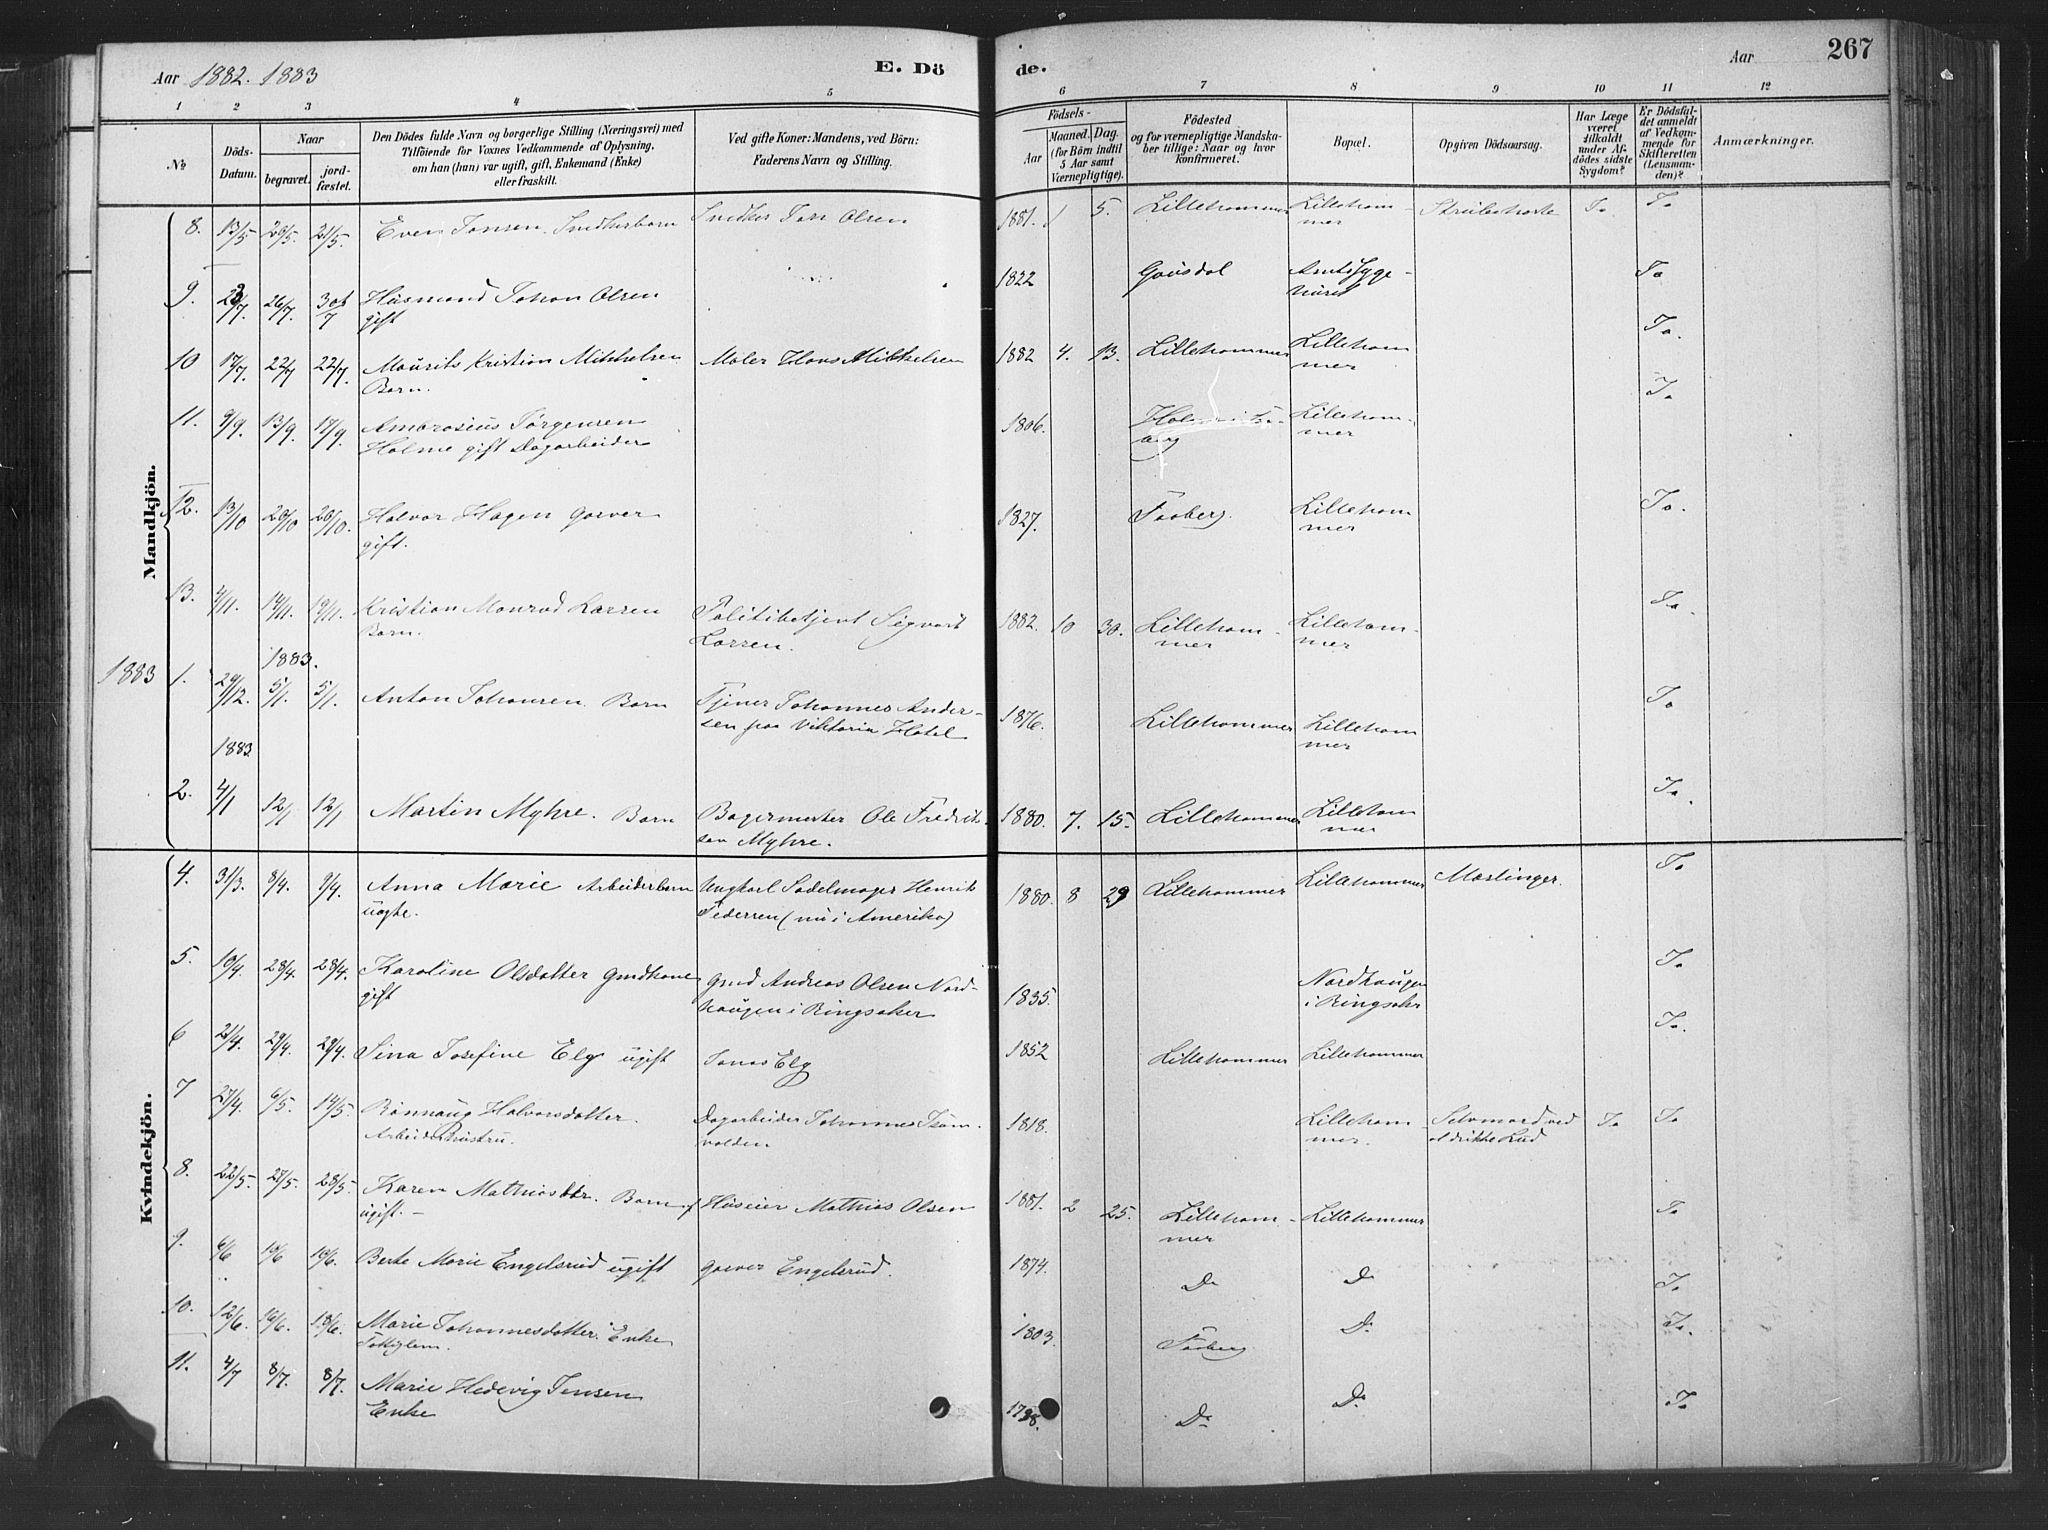 SAH, Fåberg prestekontor, H/Ha/Haa/L0010: Parish register (official) no. 10, 1879-1900, p. 267